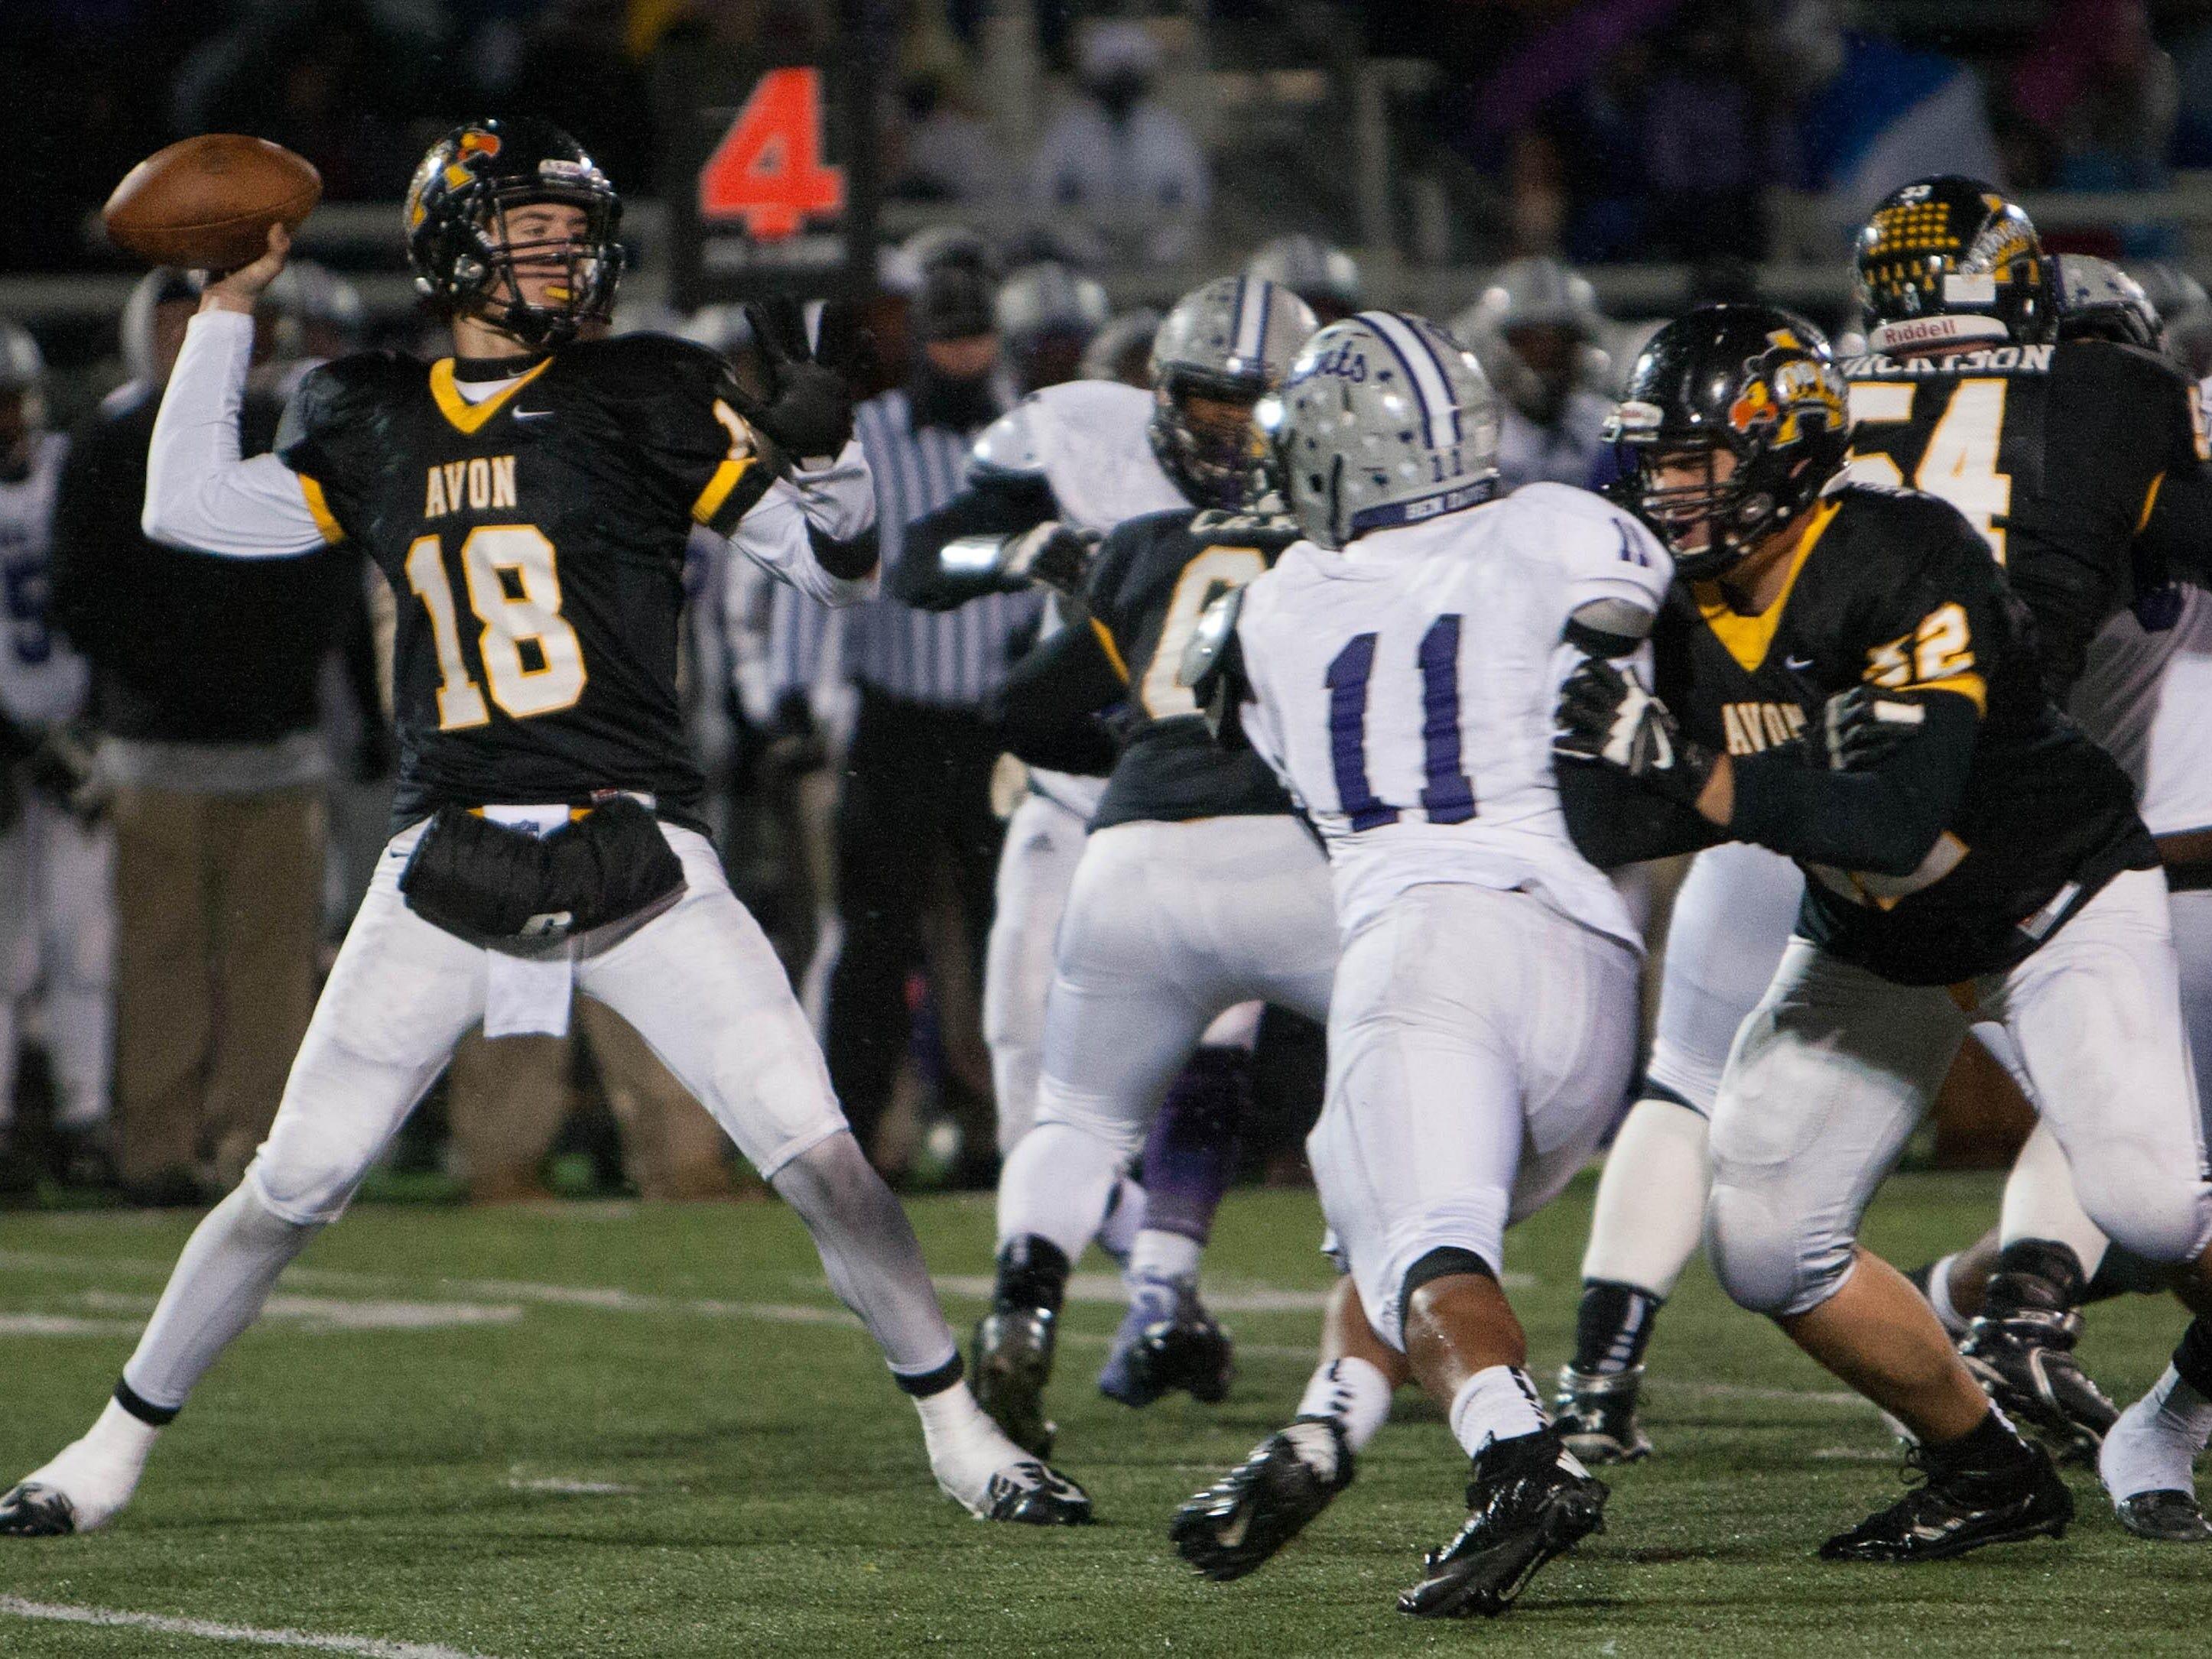 Avon quarterback Brandon Peters throws a pass against Ben Davis during sectional action at Avon, Oct. 31, 2014. The teams meet in Week 2 of the regular season.